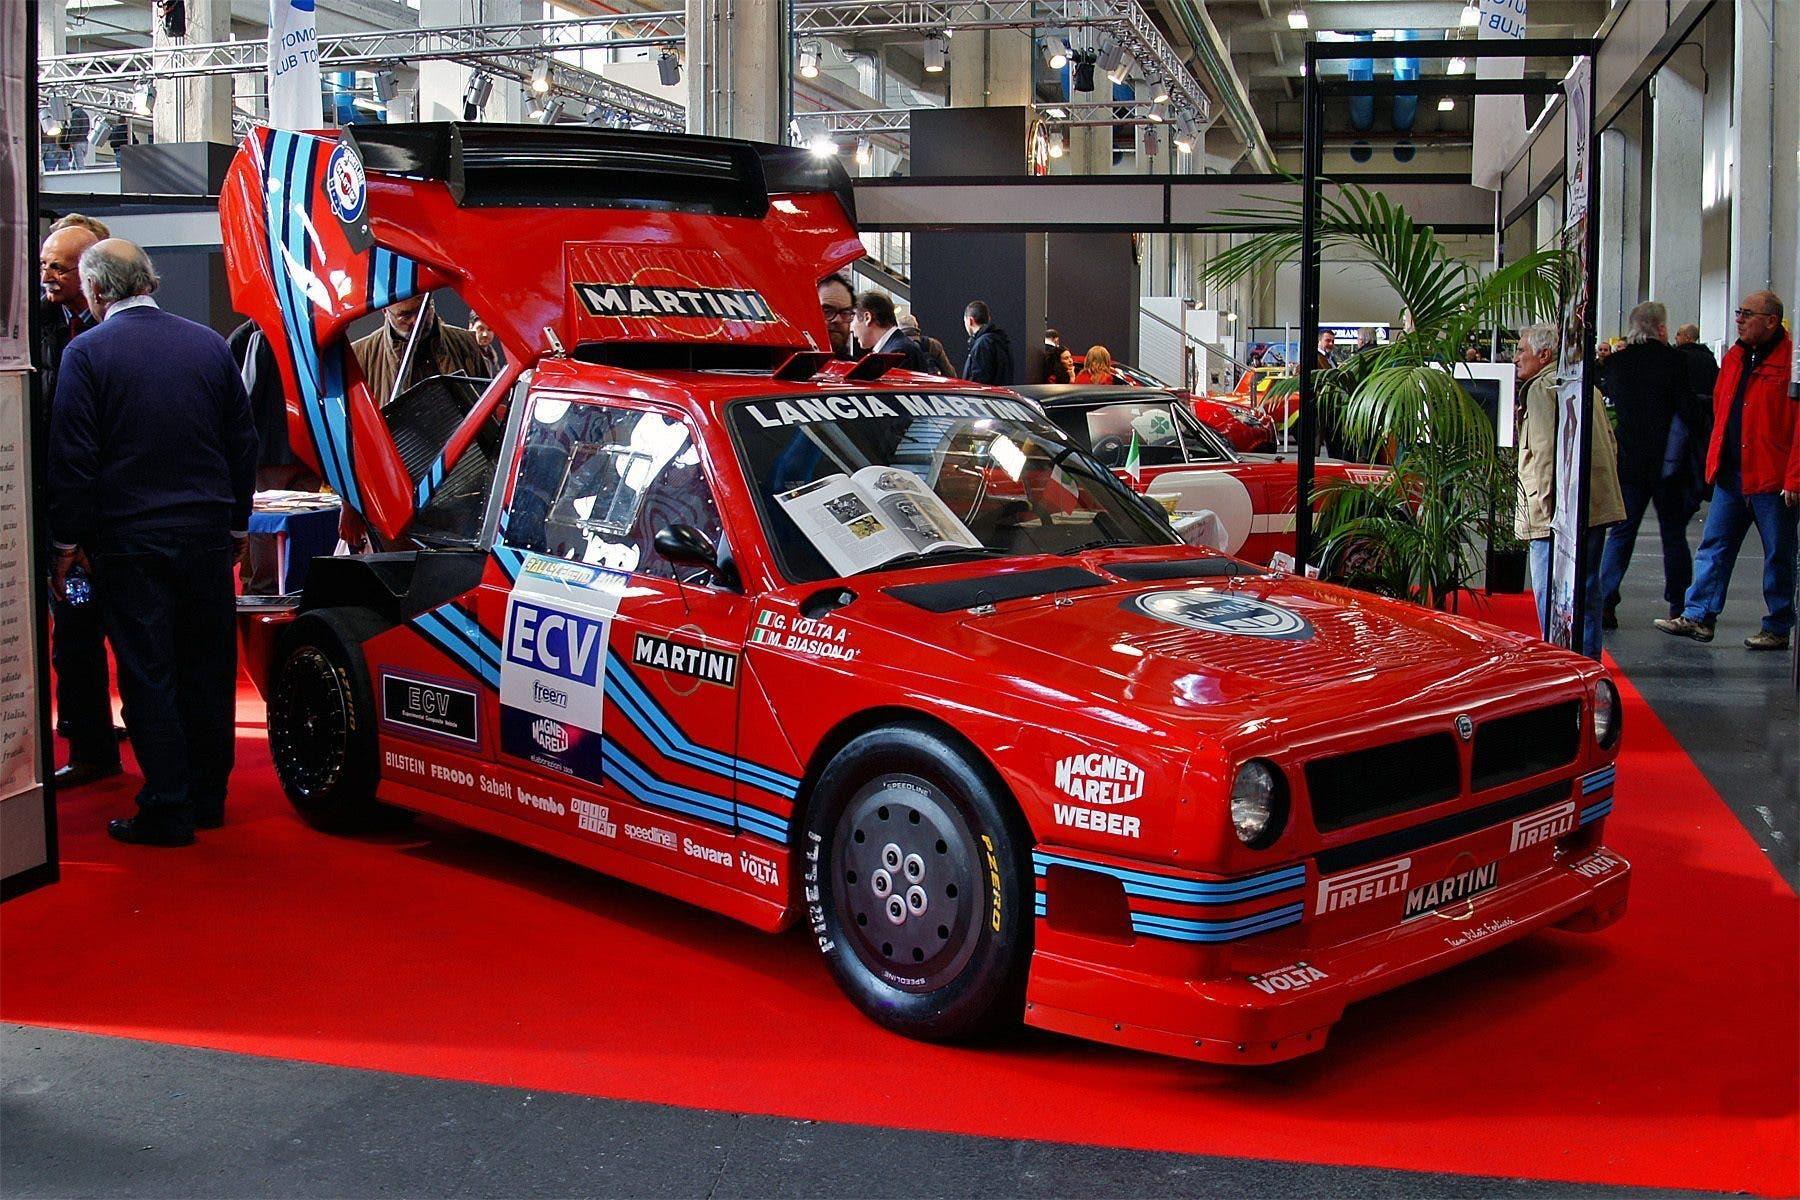 Lancia Delta ECV